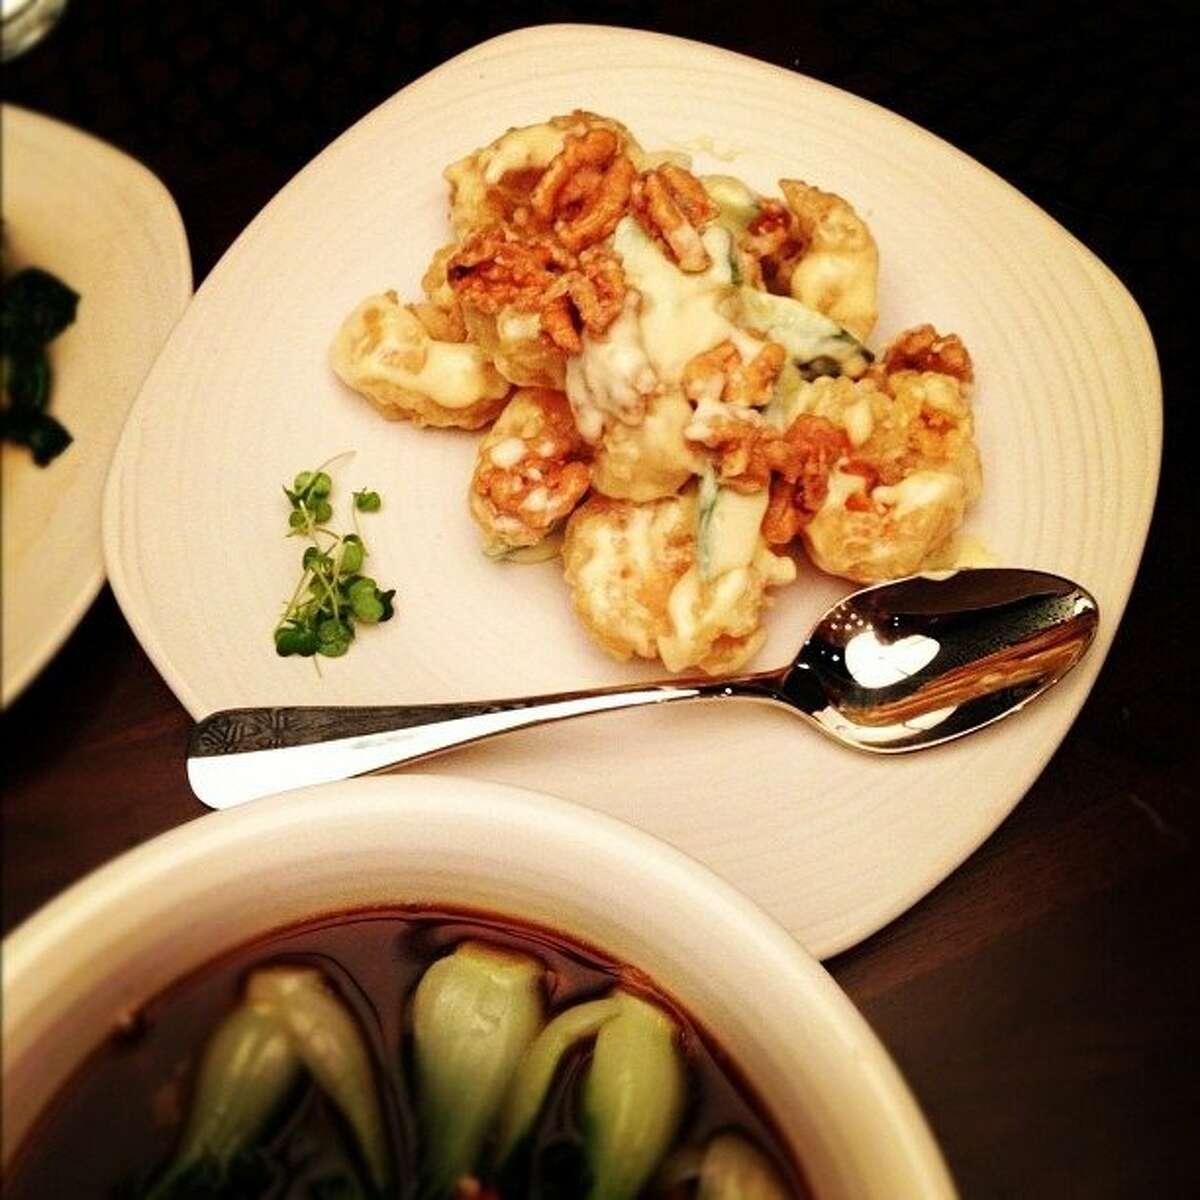 Honey Walnut shrimp at M.Y. China.